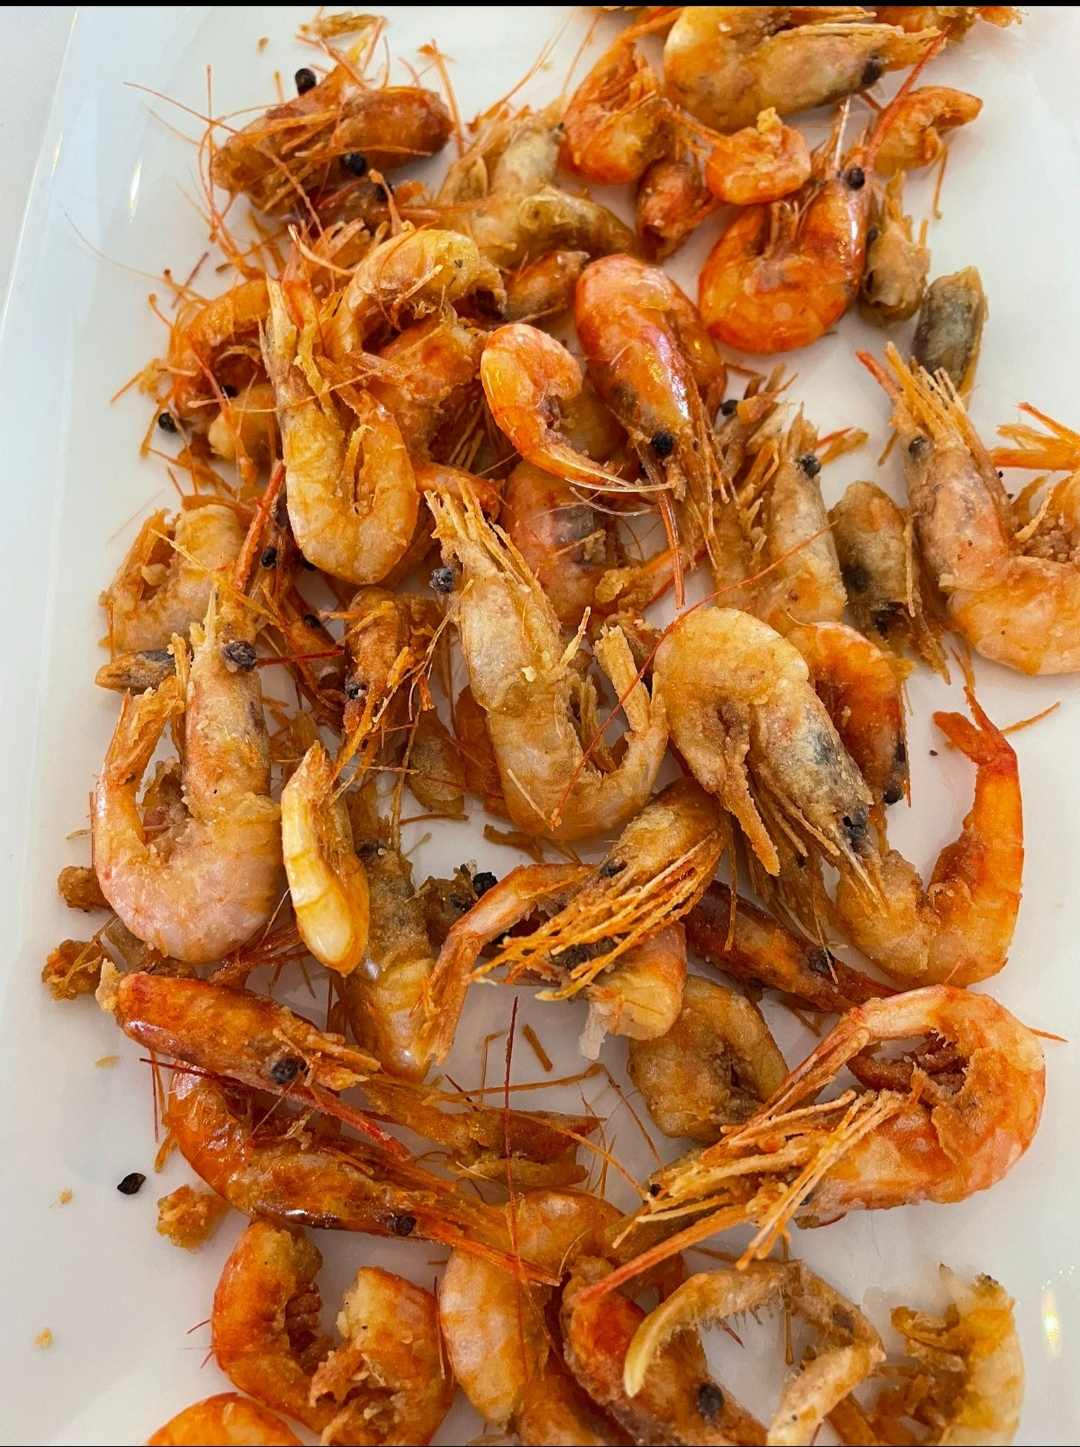 Reseñas gastronómicas: Restaurante Bon Vent 4